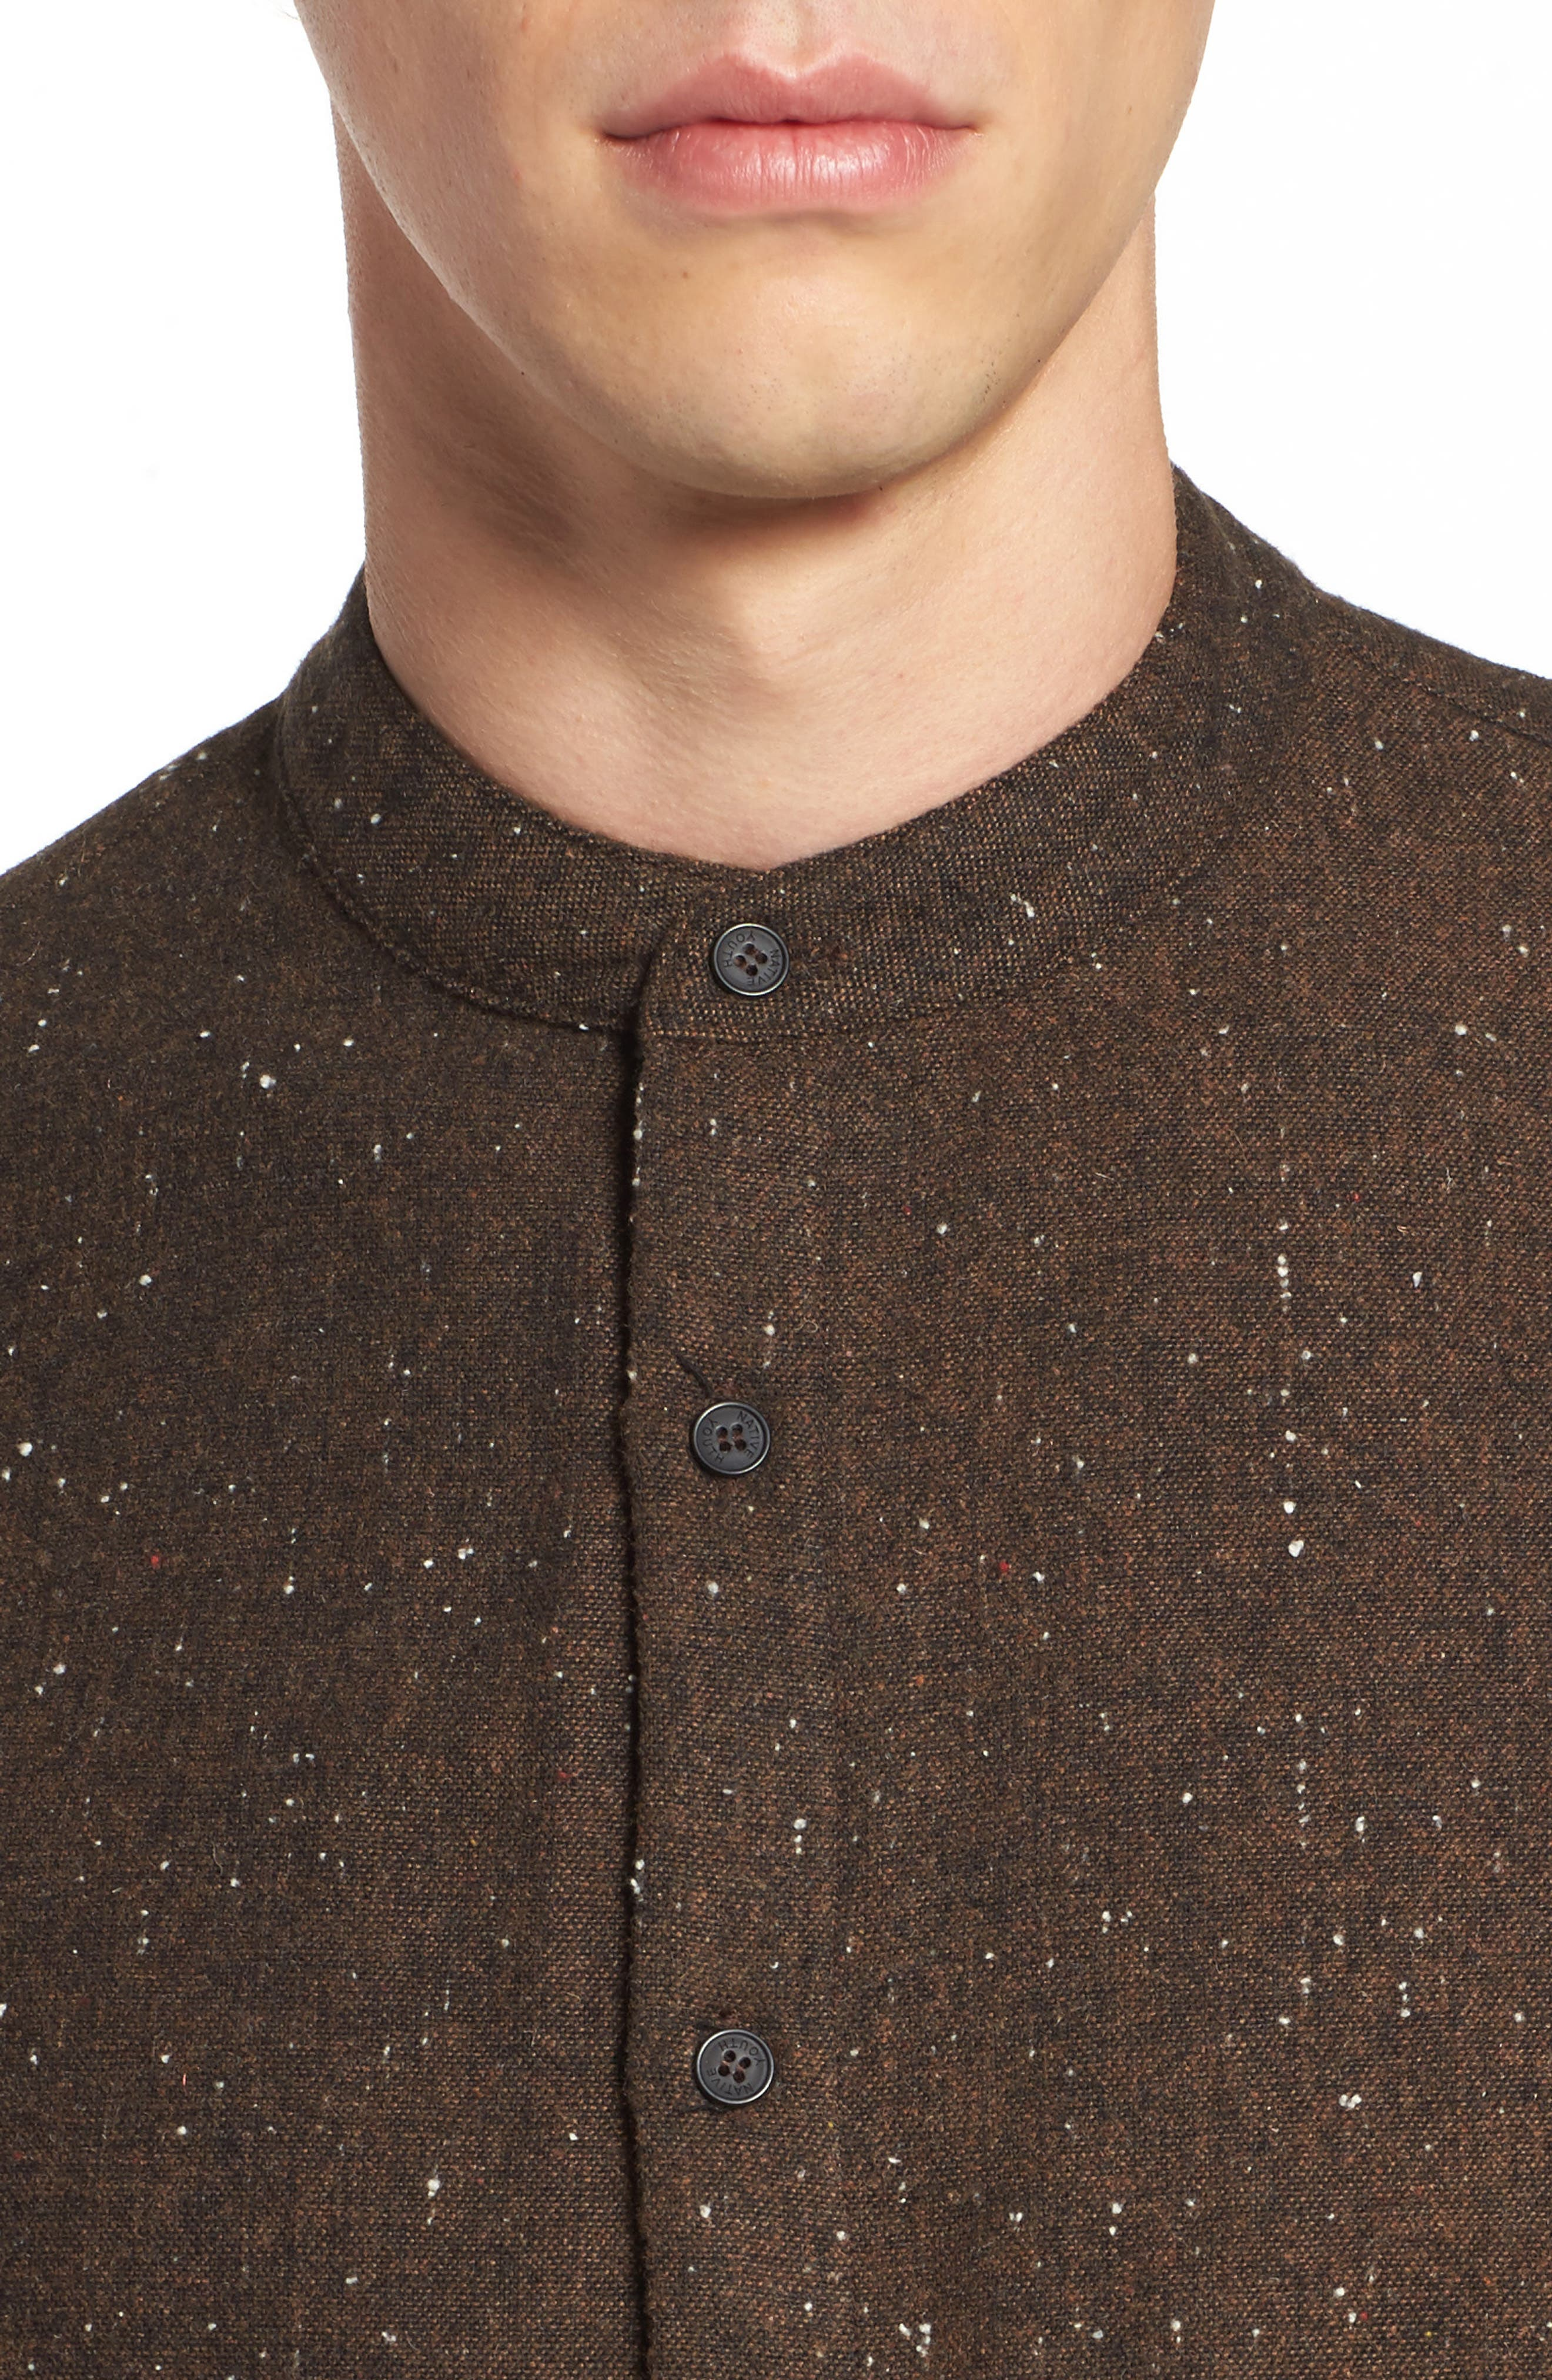 Alford Nep Shirt,                             Alternate thumbnail 4, color,                             200